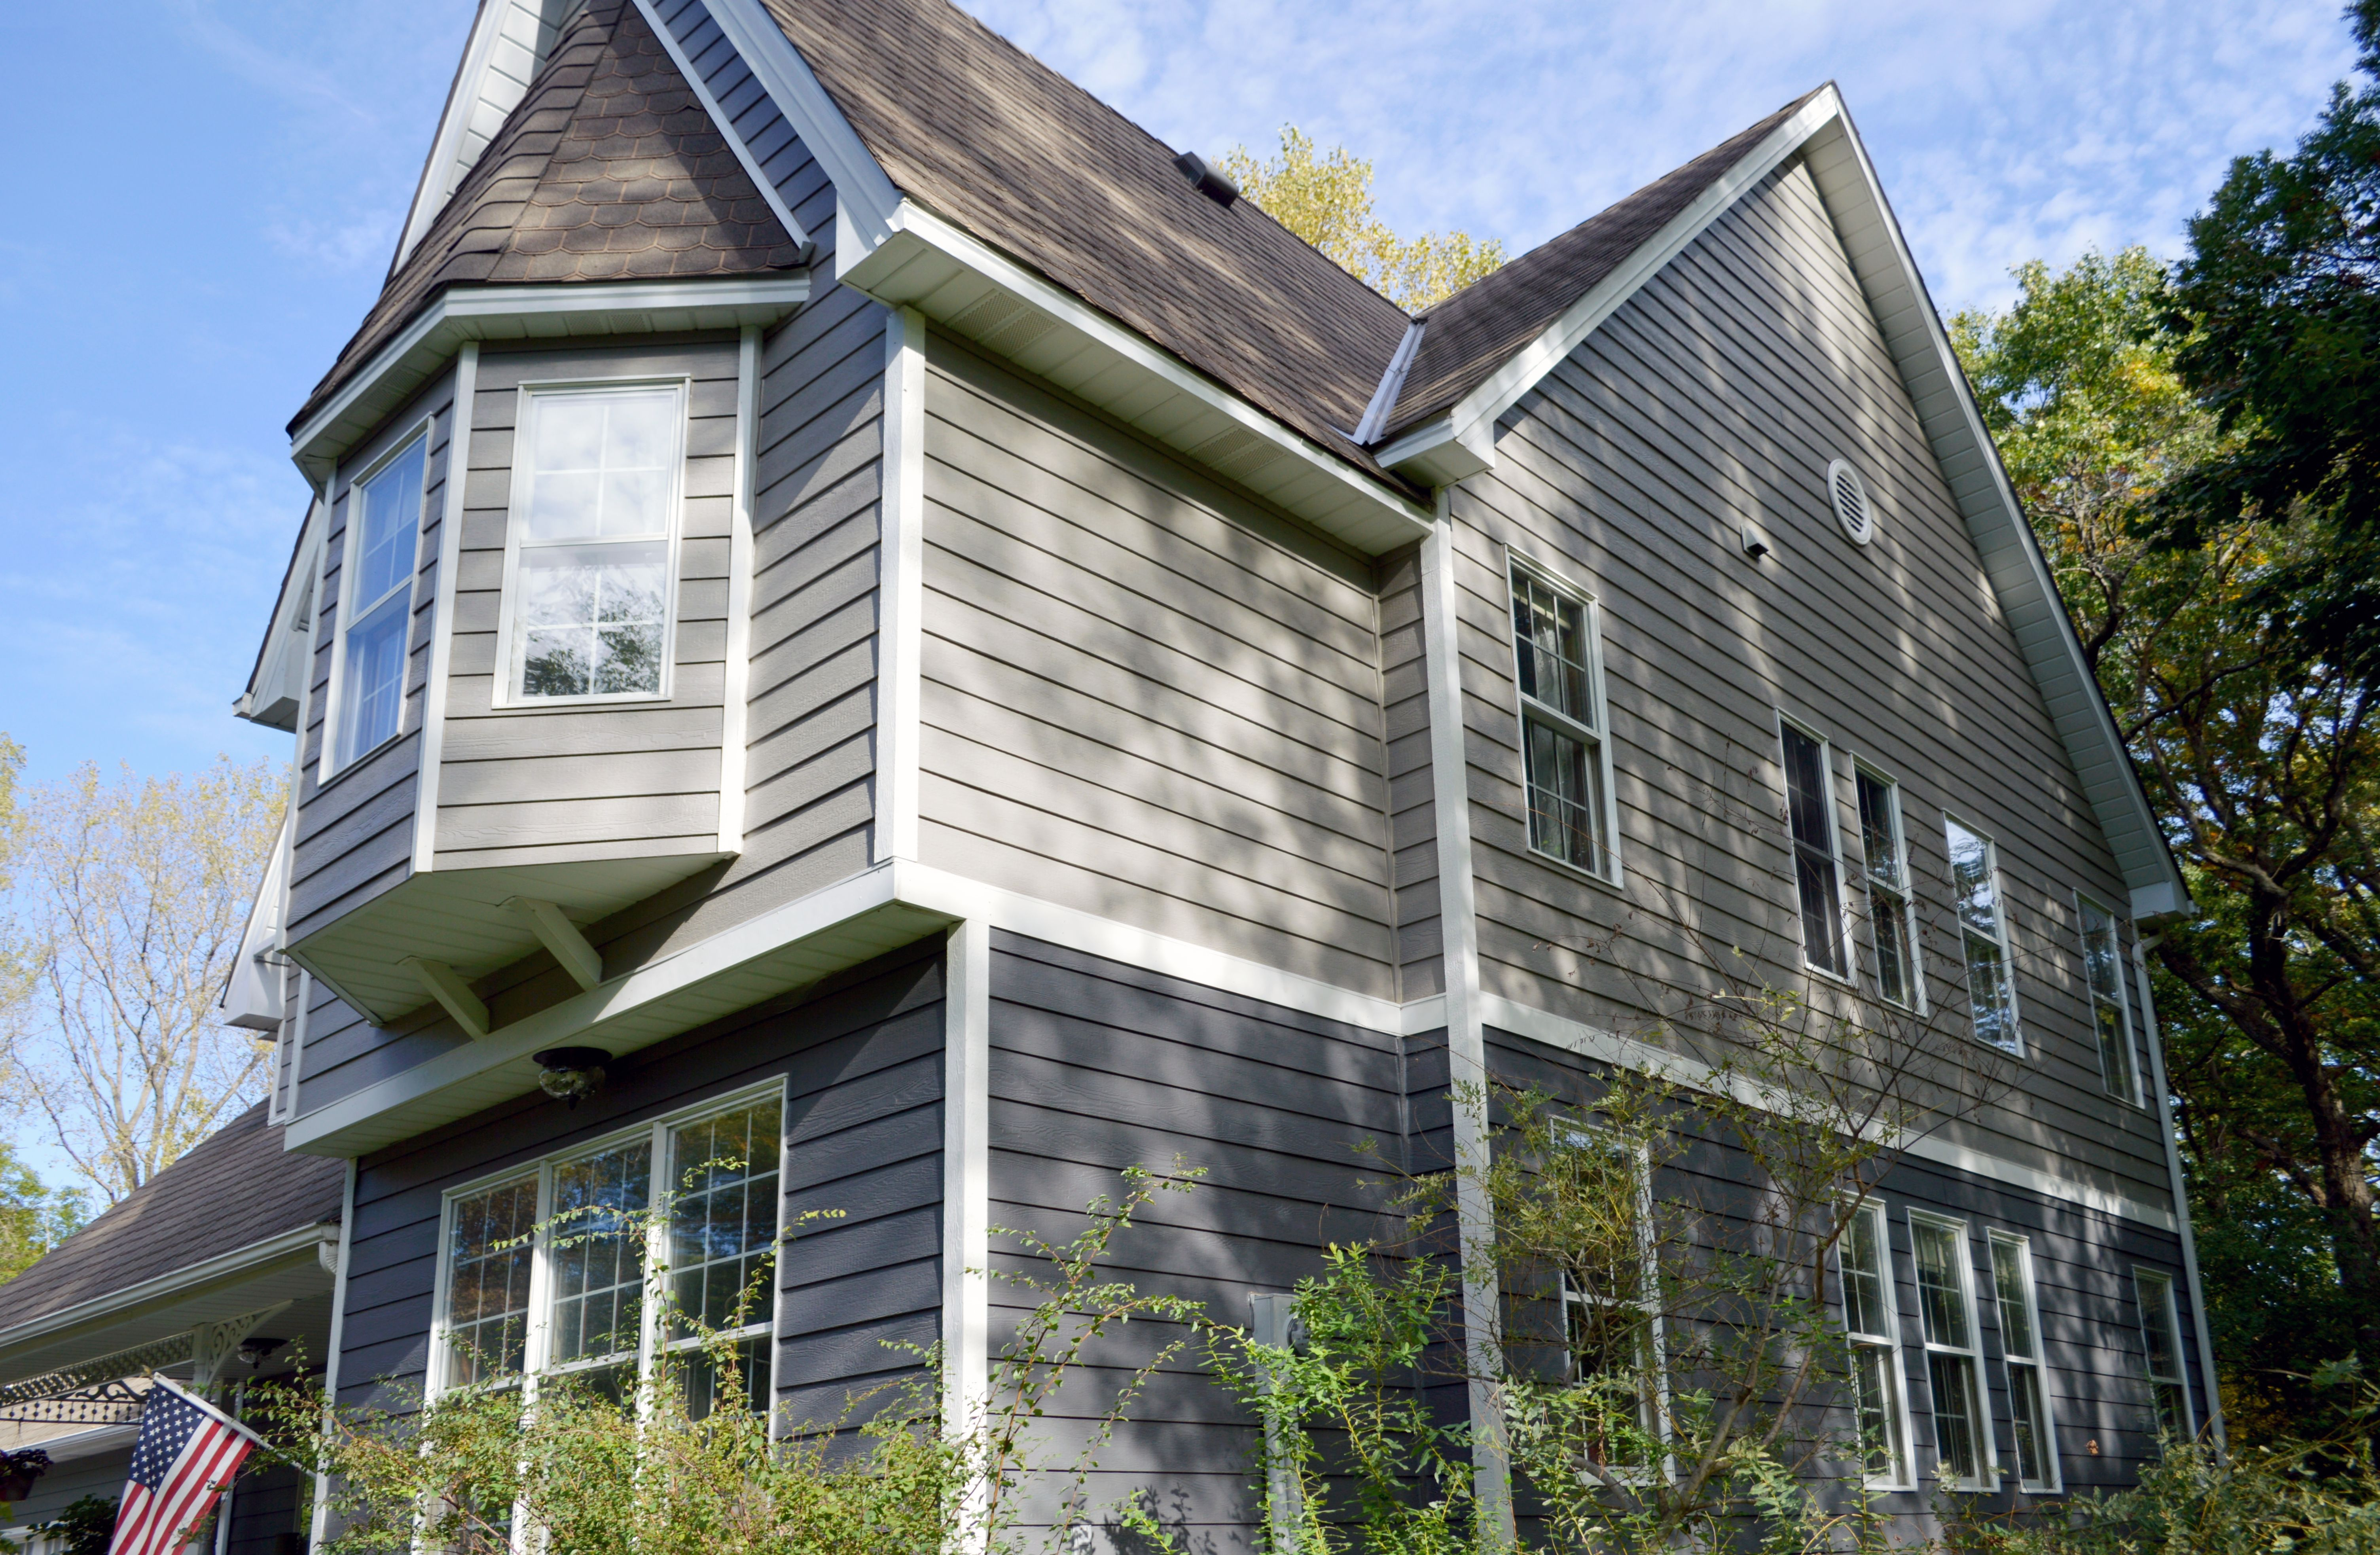 Lp Smartside Siding Peppercorn And Dovetail Installing Siding Bay Window Exterior Siding